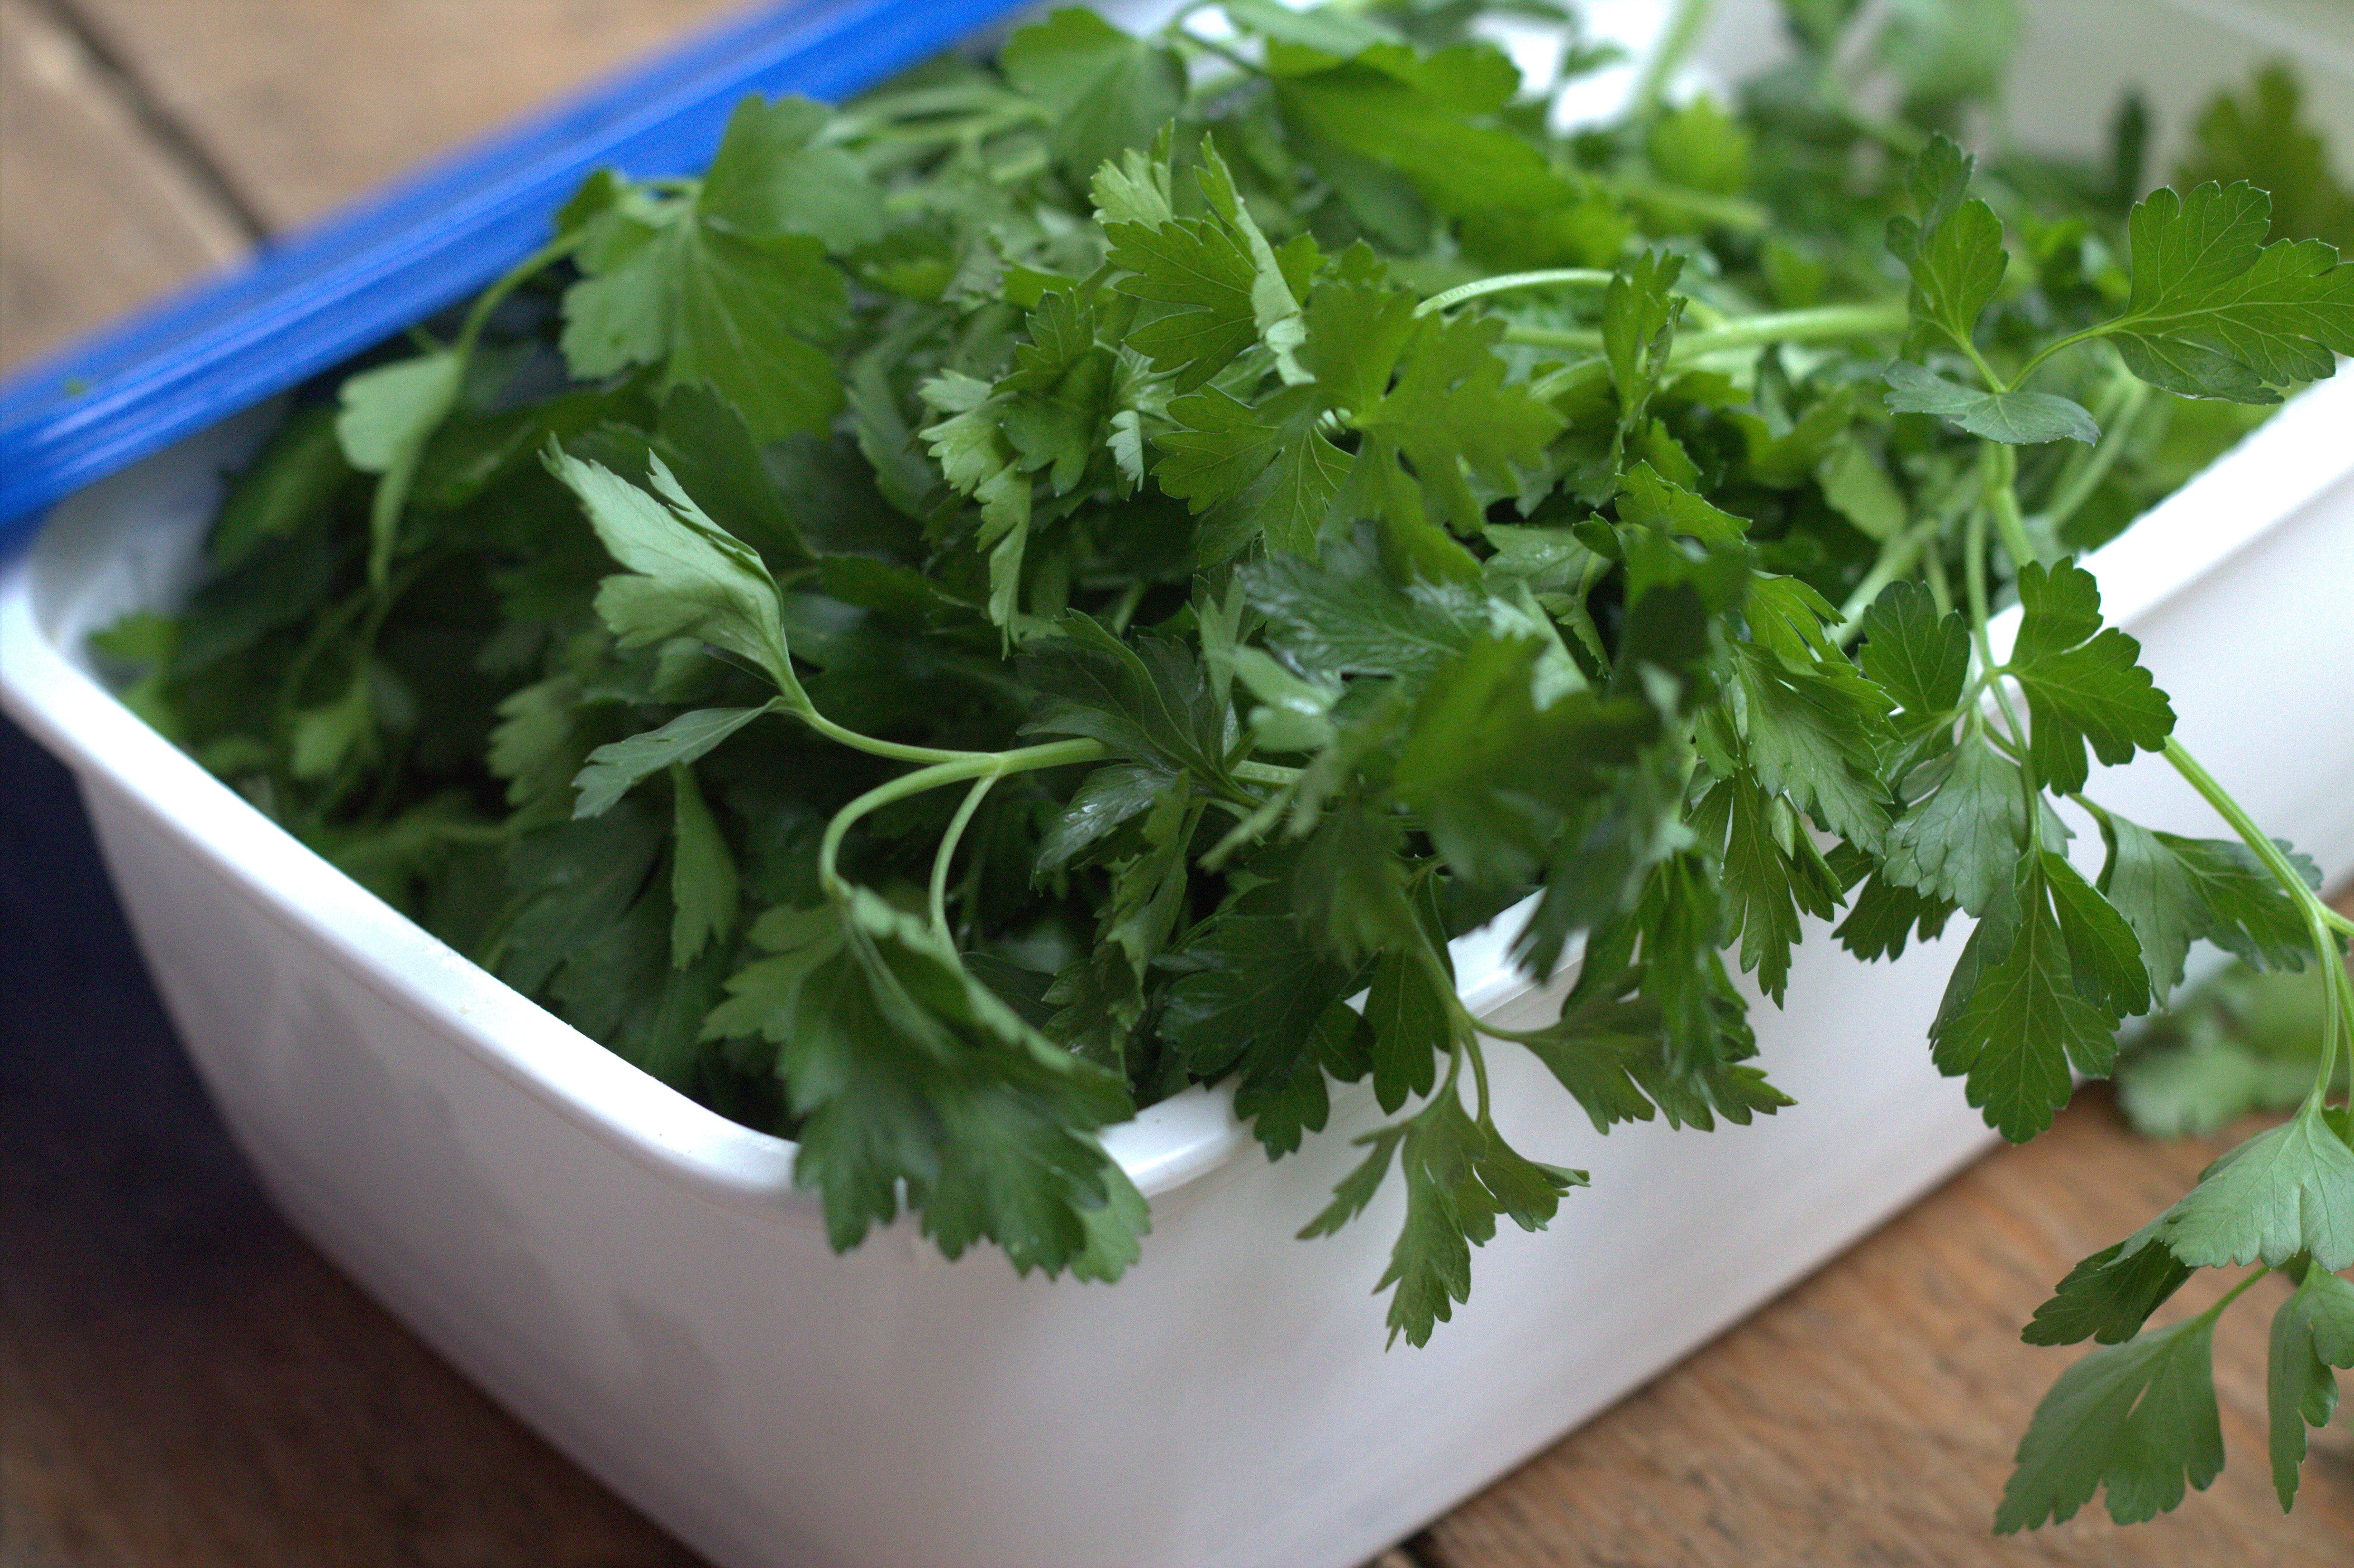 Comment conserver les herbes aromatiques : persil, coriandre...